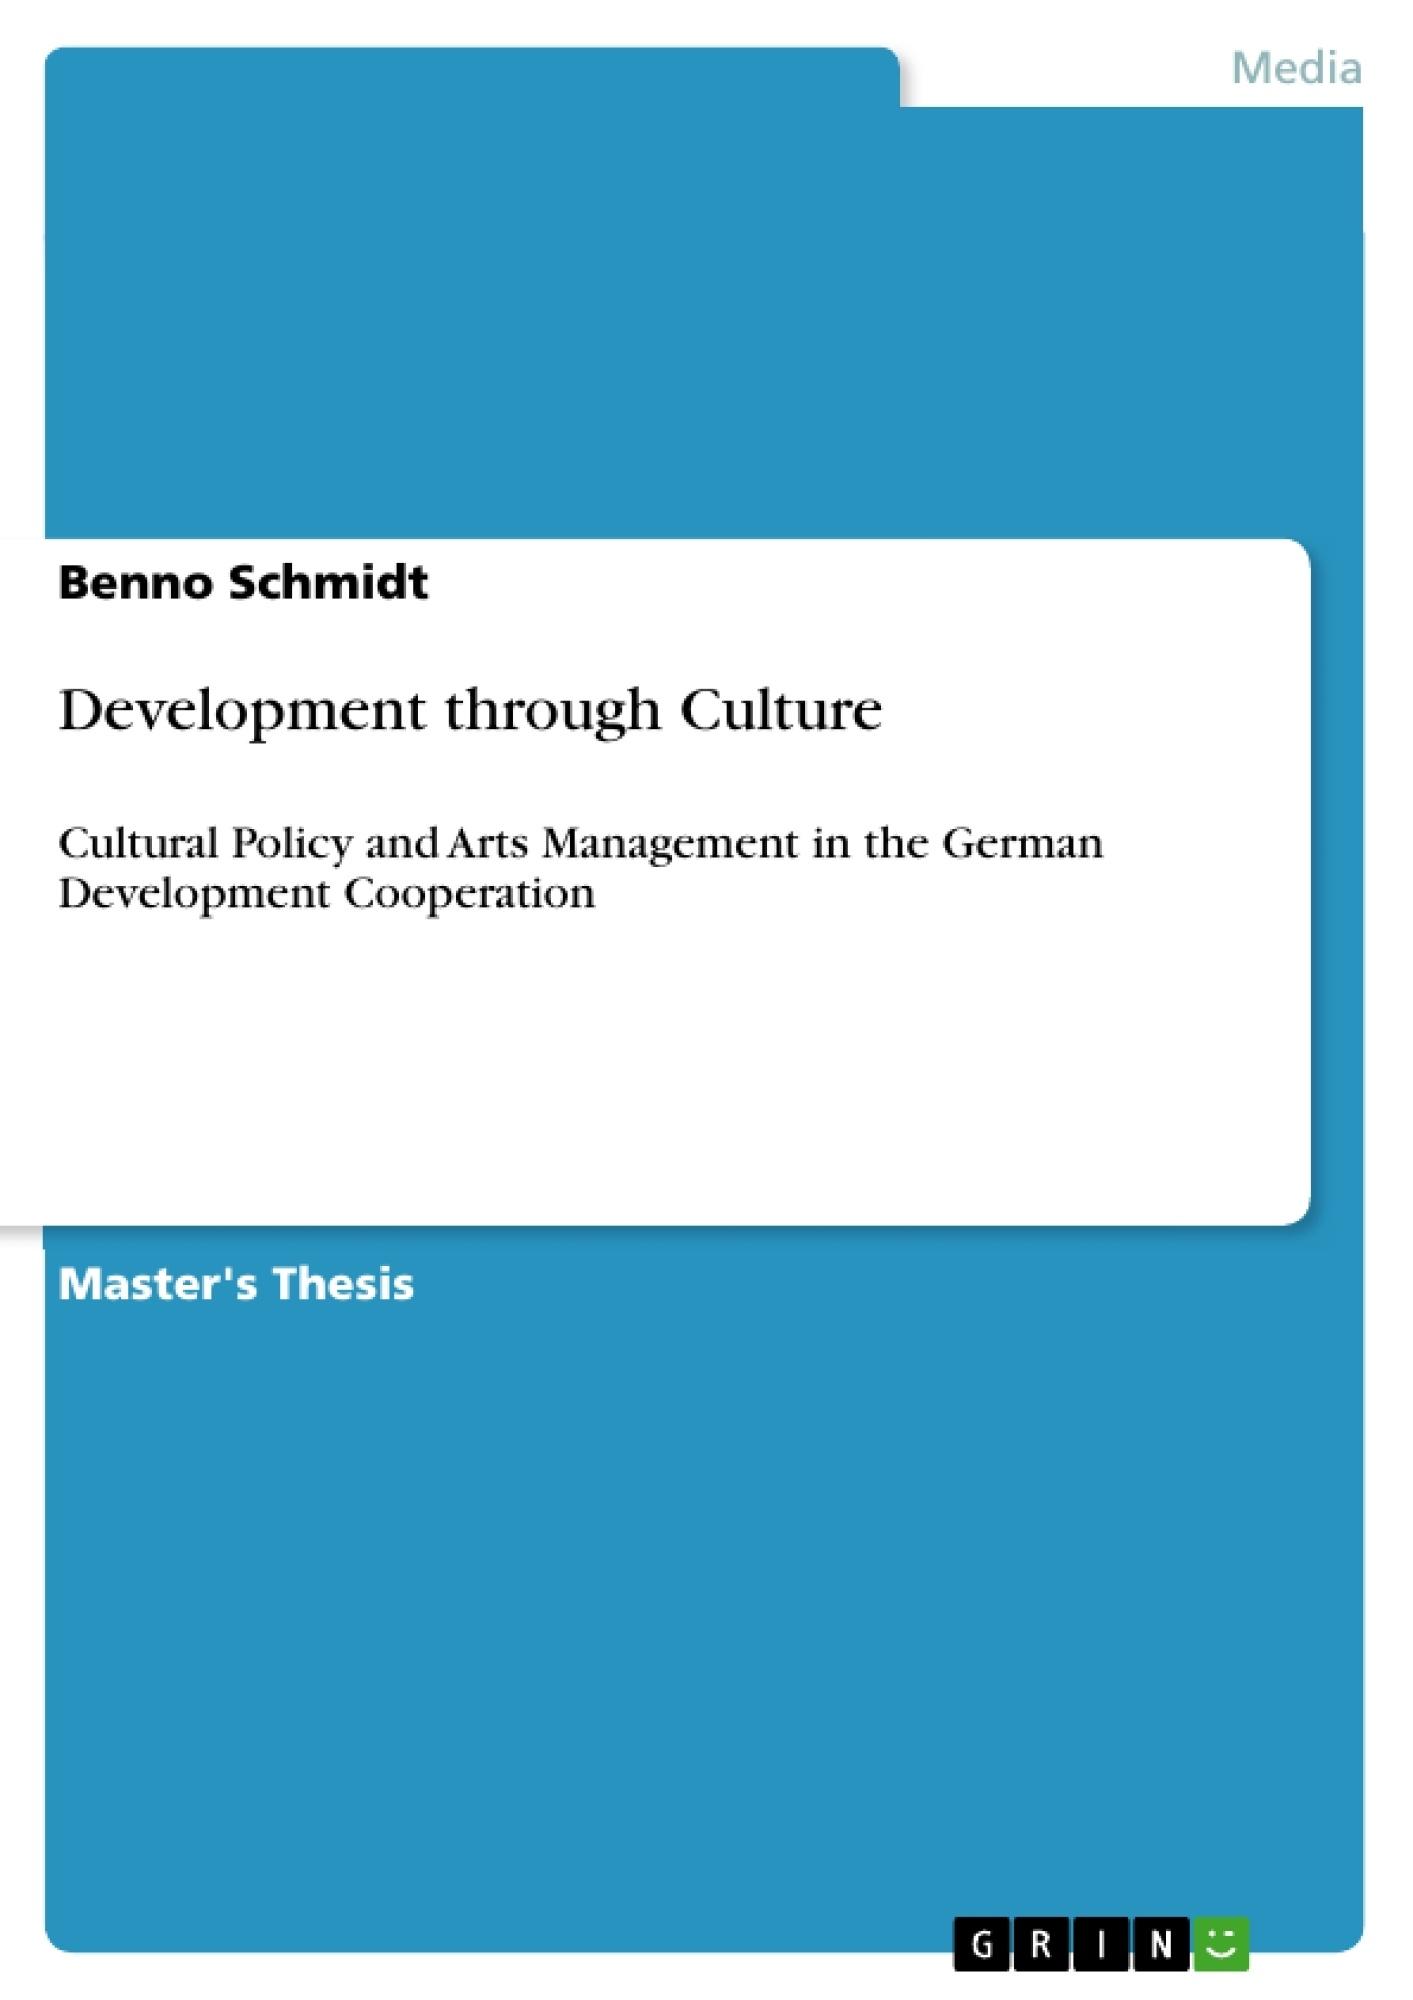 Title: Development through Culture